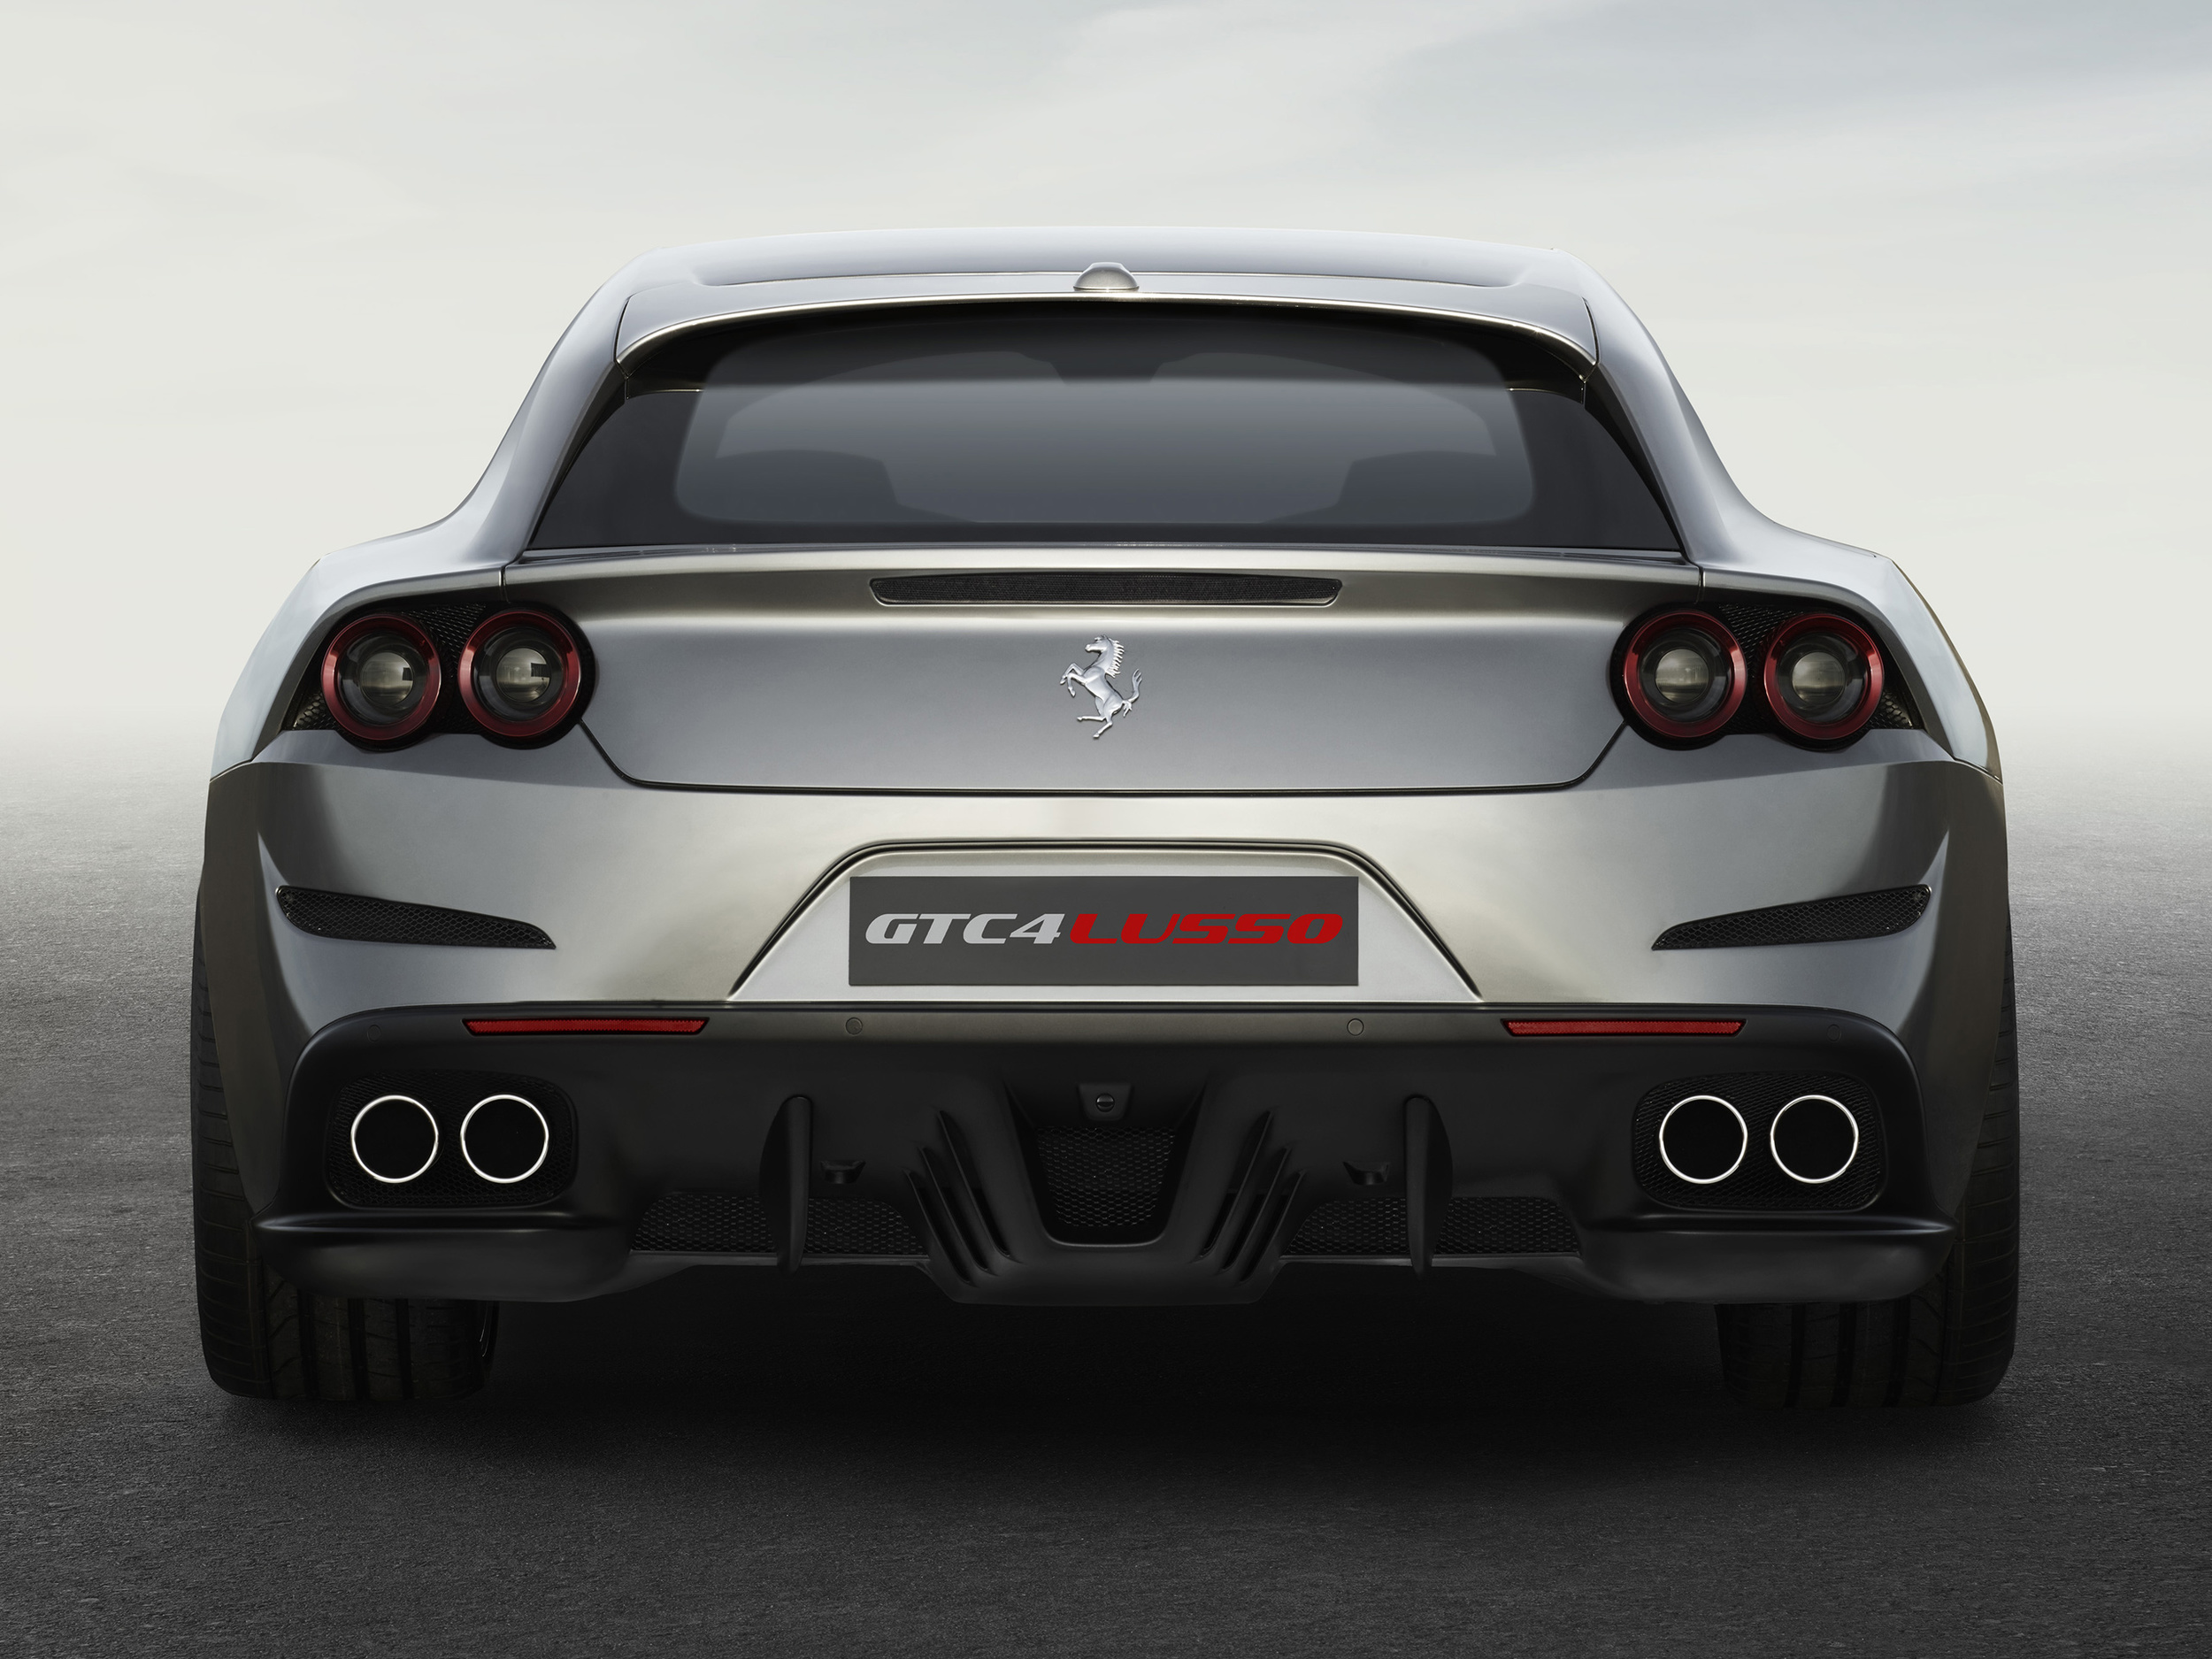 Ferrari_GTC4Lusso_rear_LR.jpg